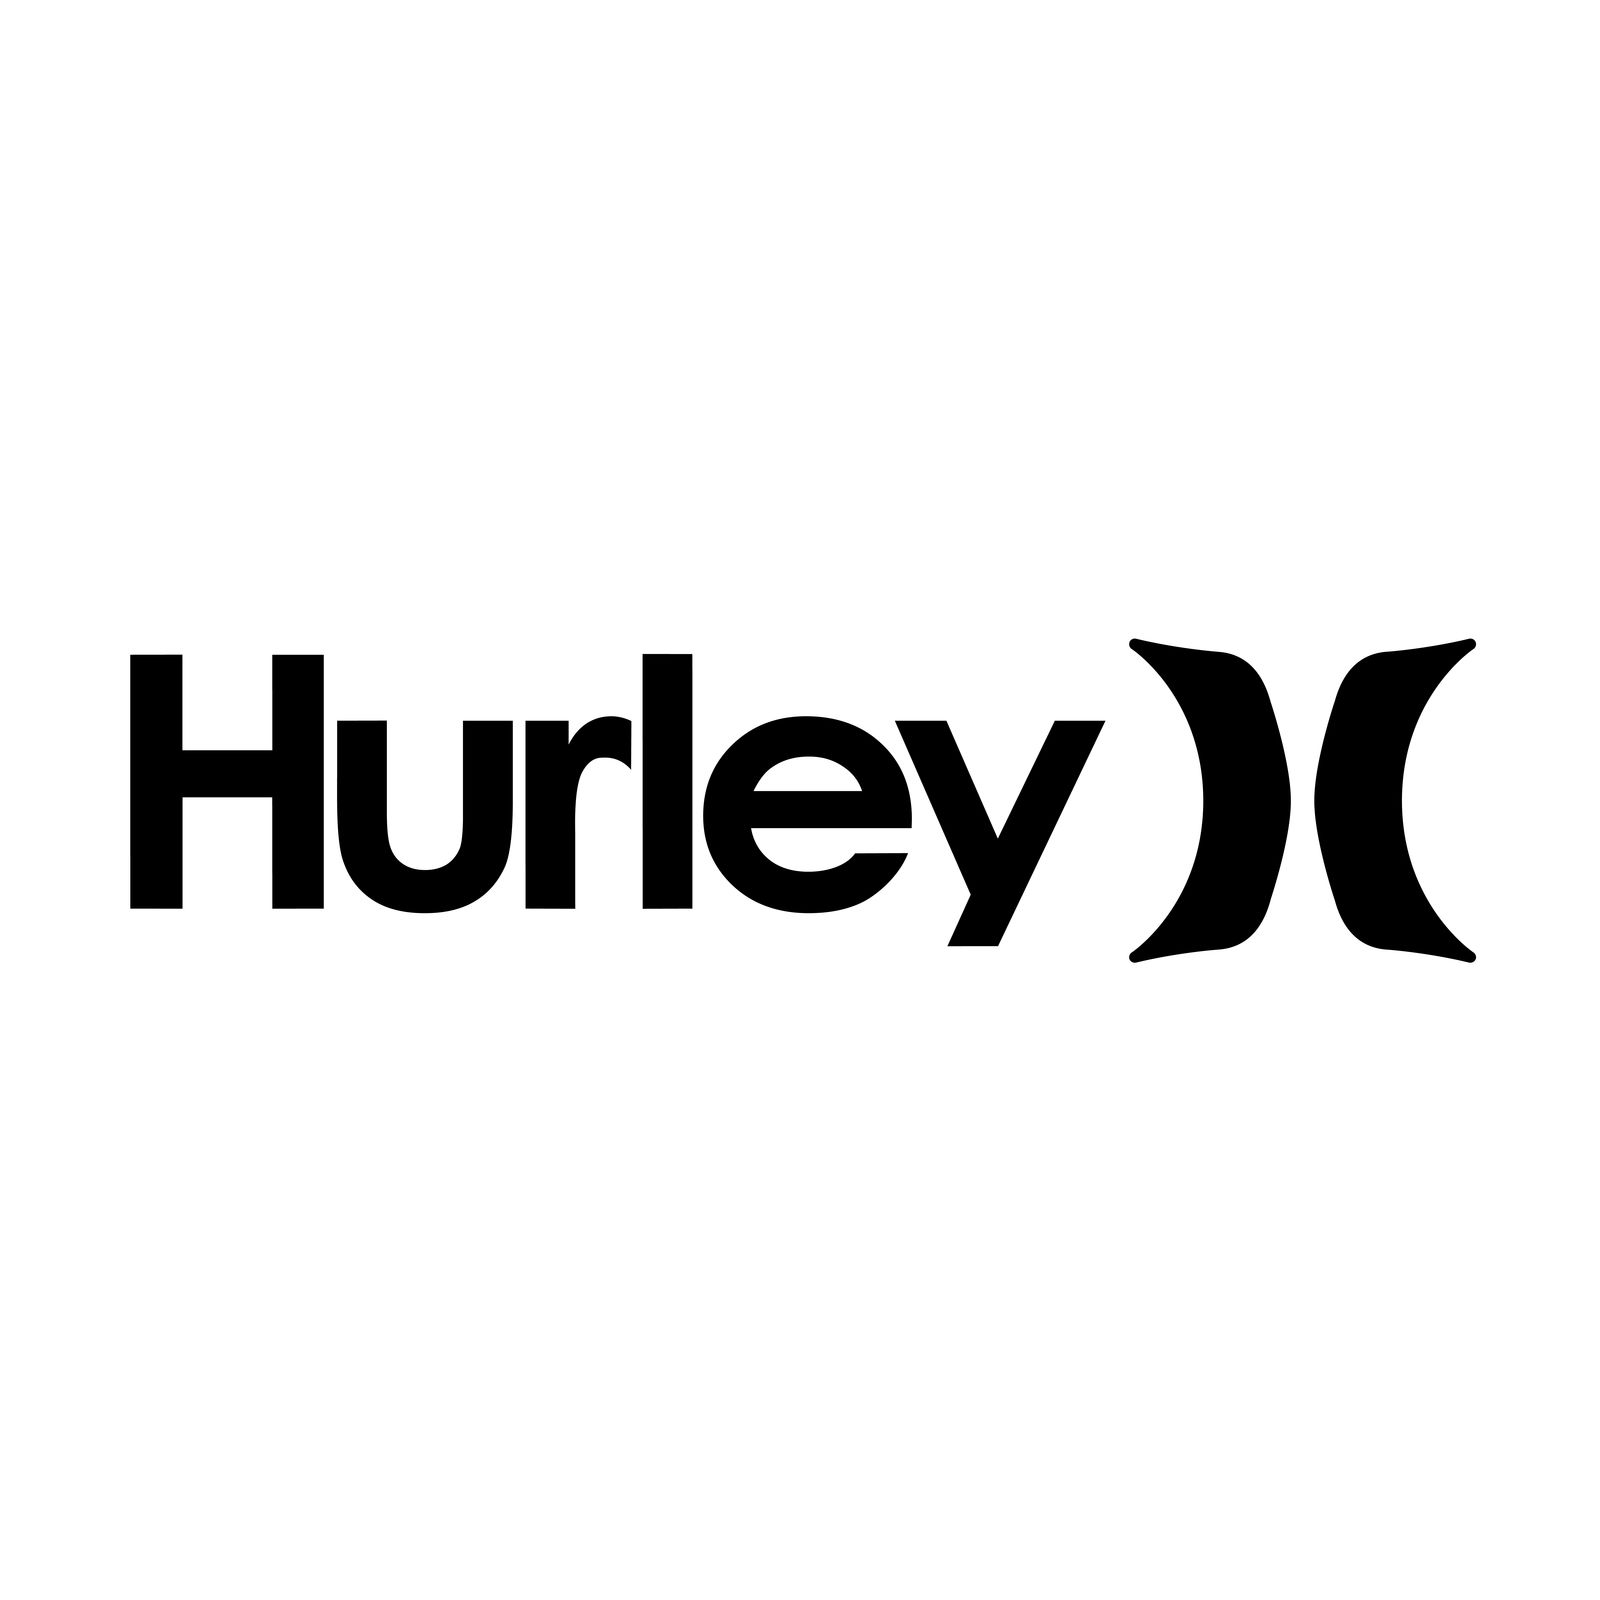 HURLEY (Image 1)